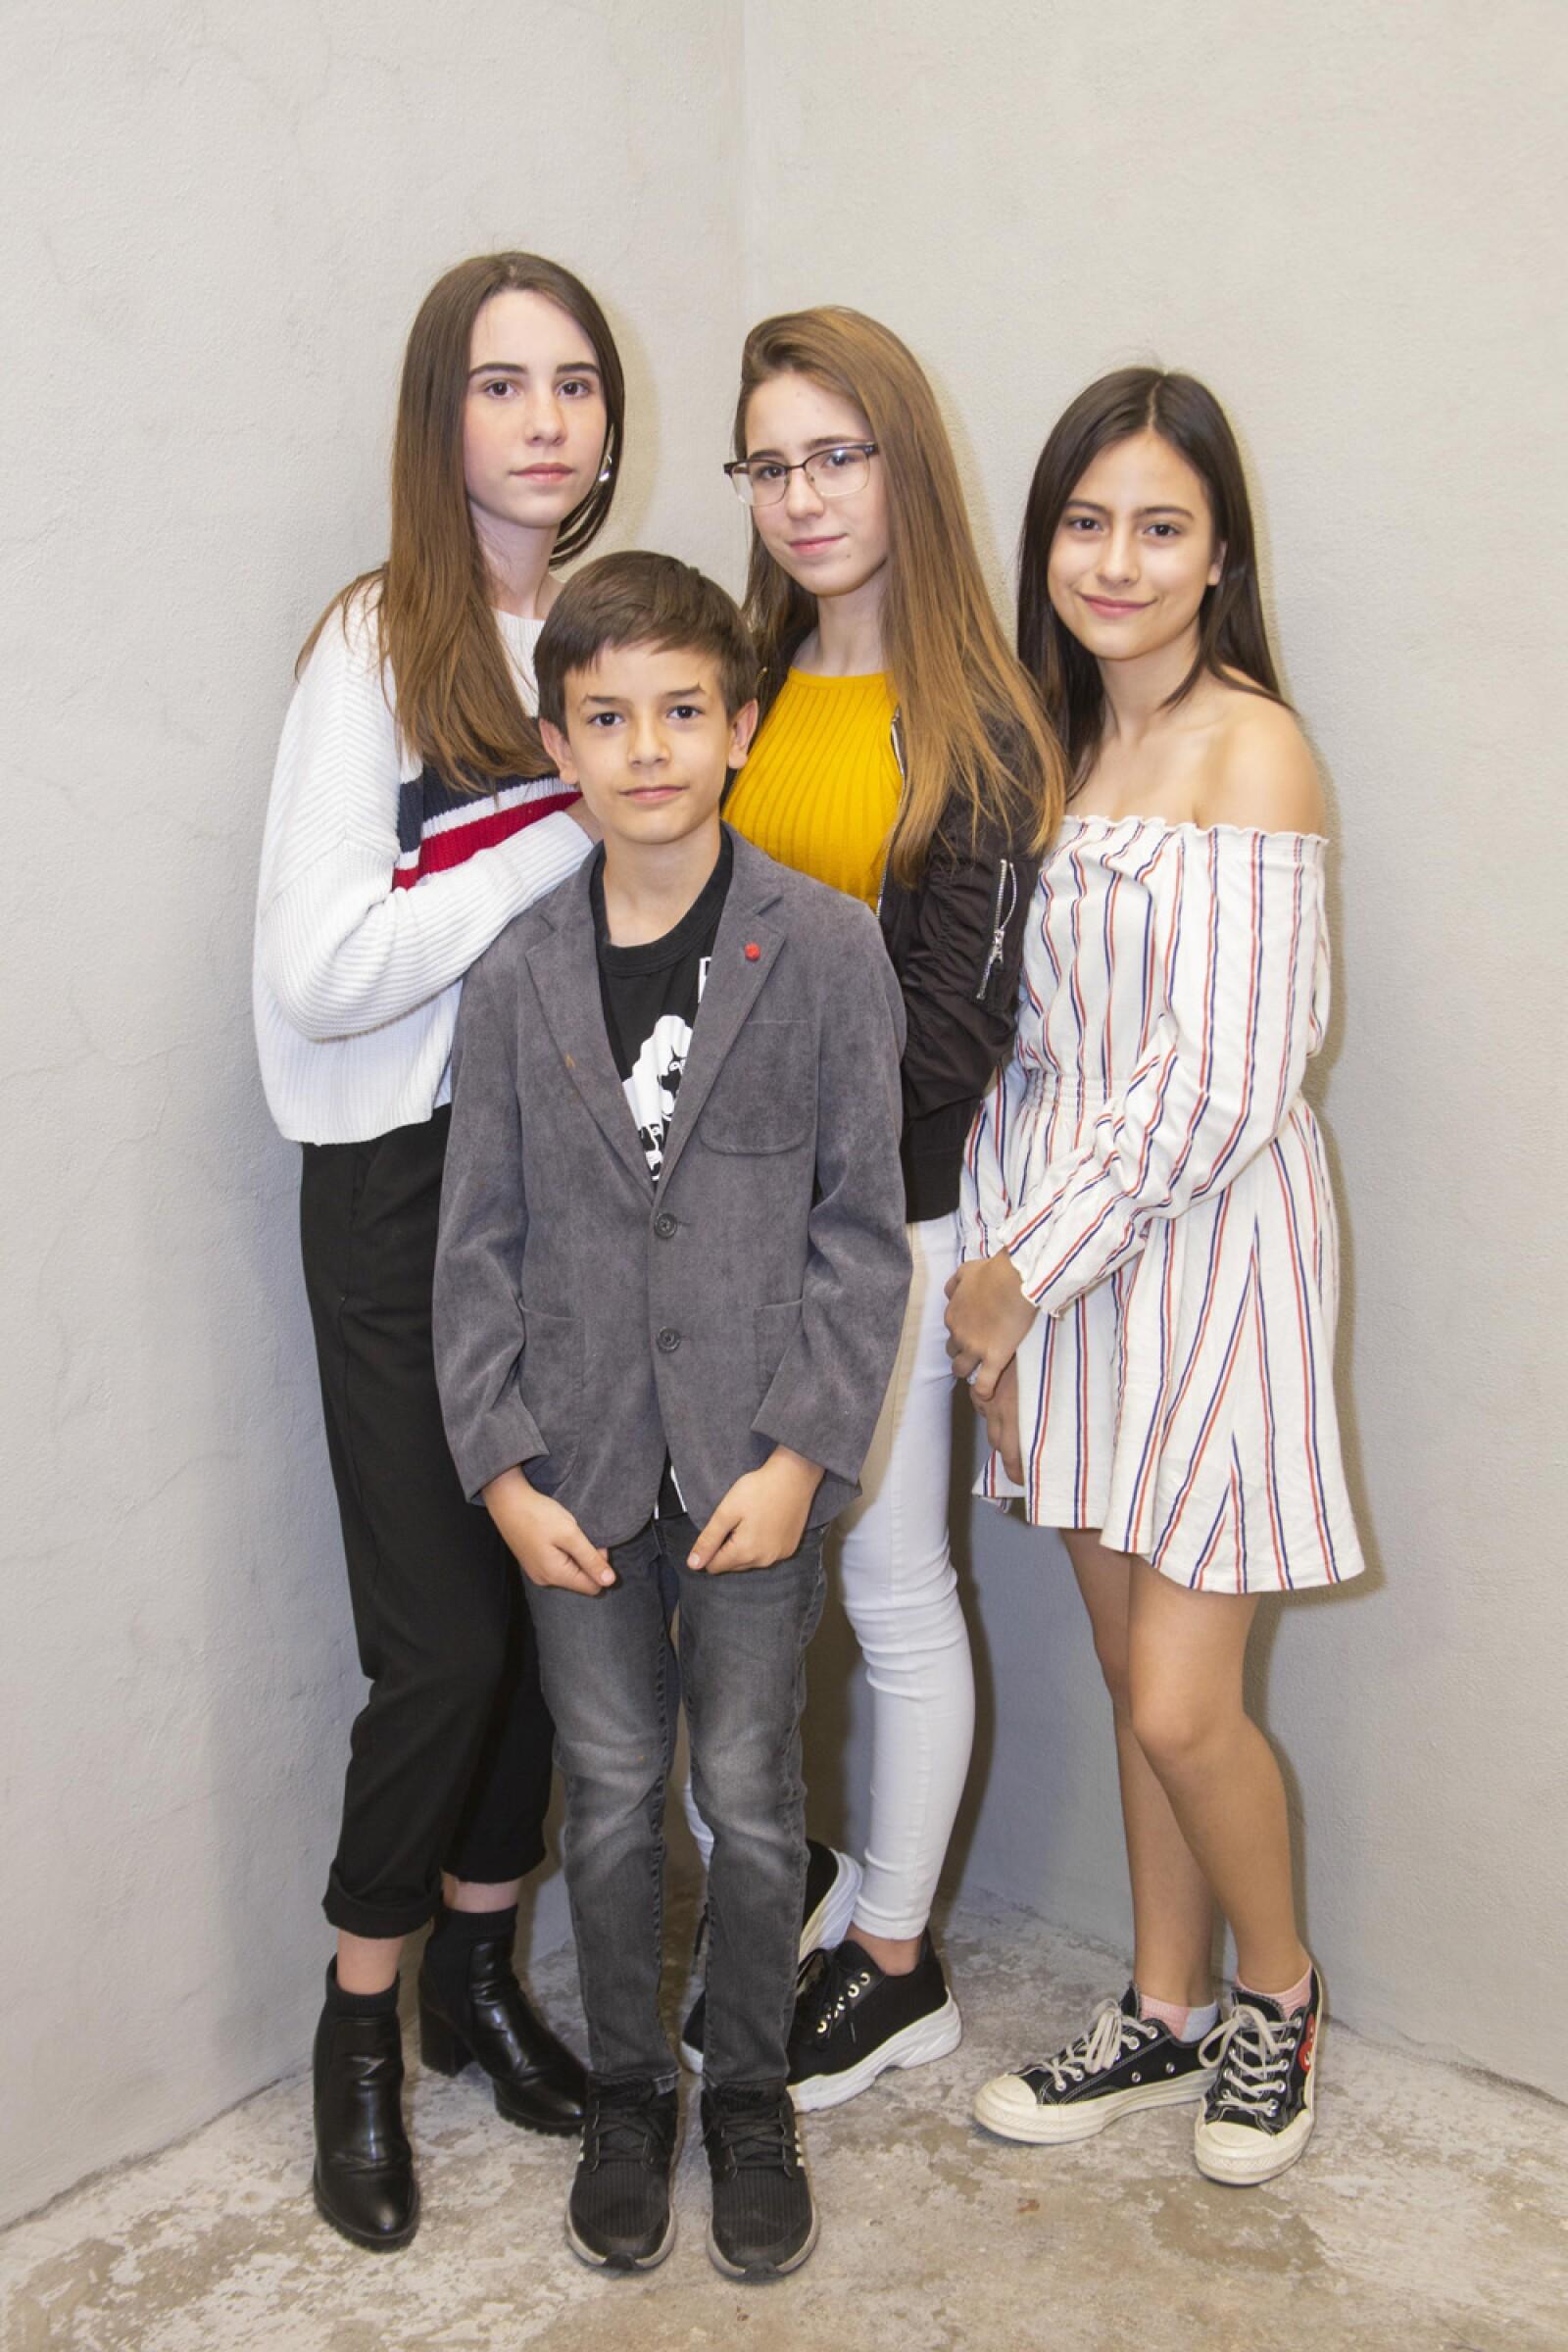 Alexia Heinen, Claudia Heinen,Laima Reyes, Cristóbal Reyes